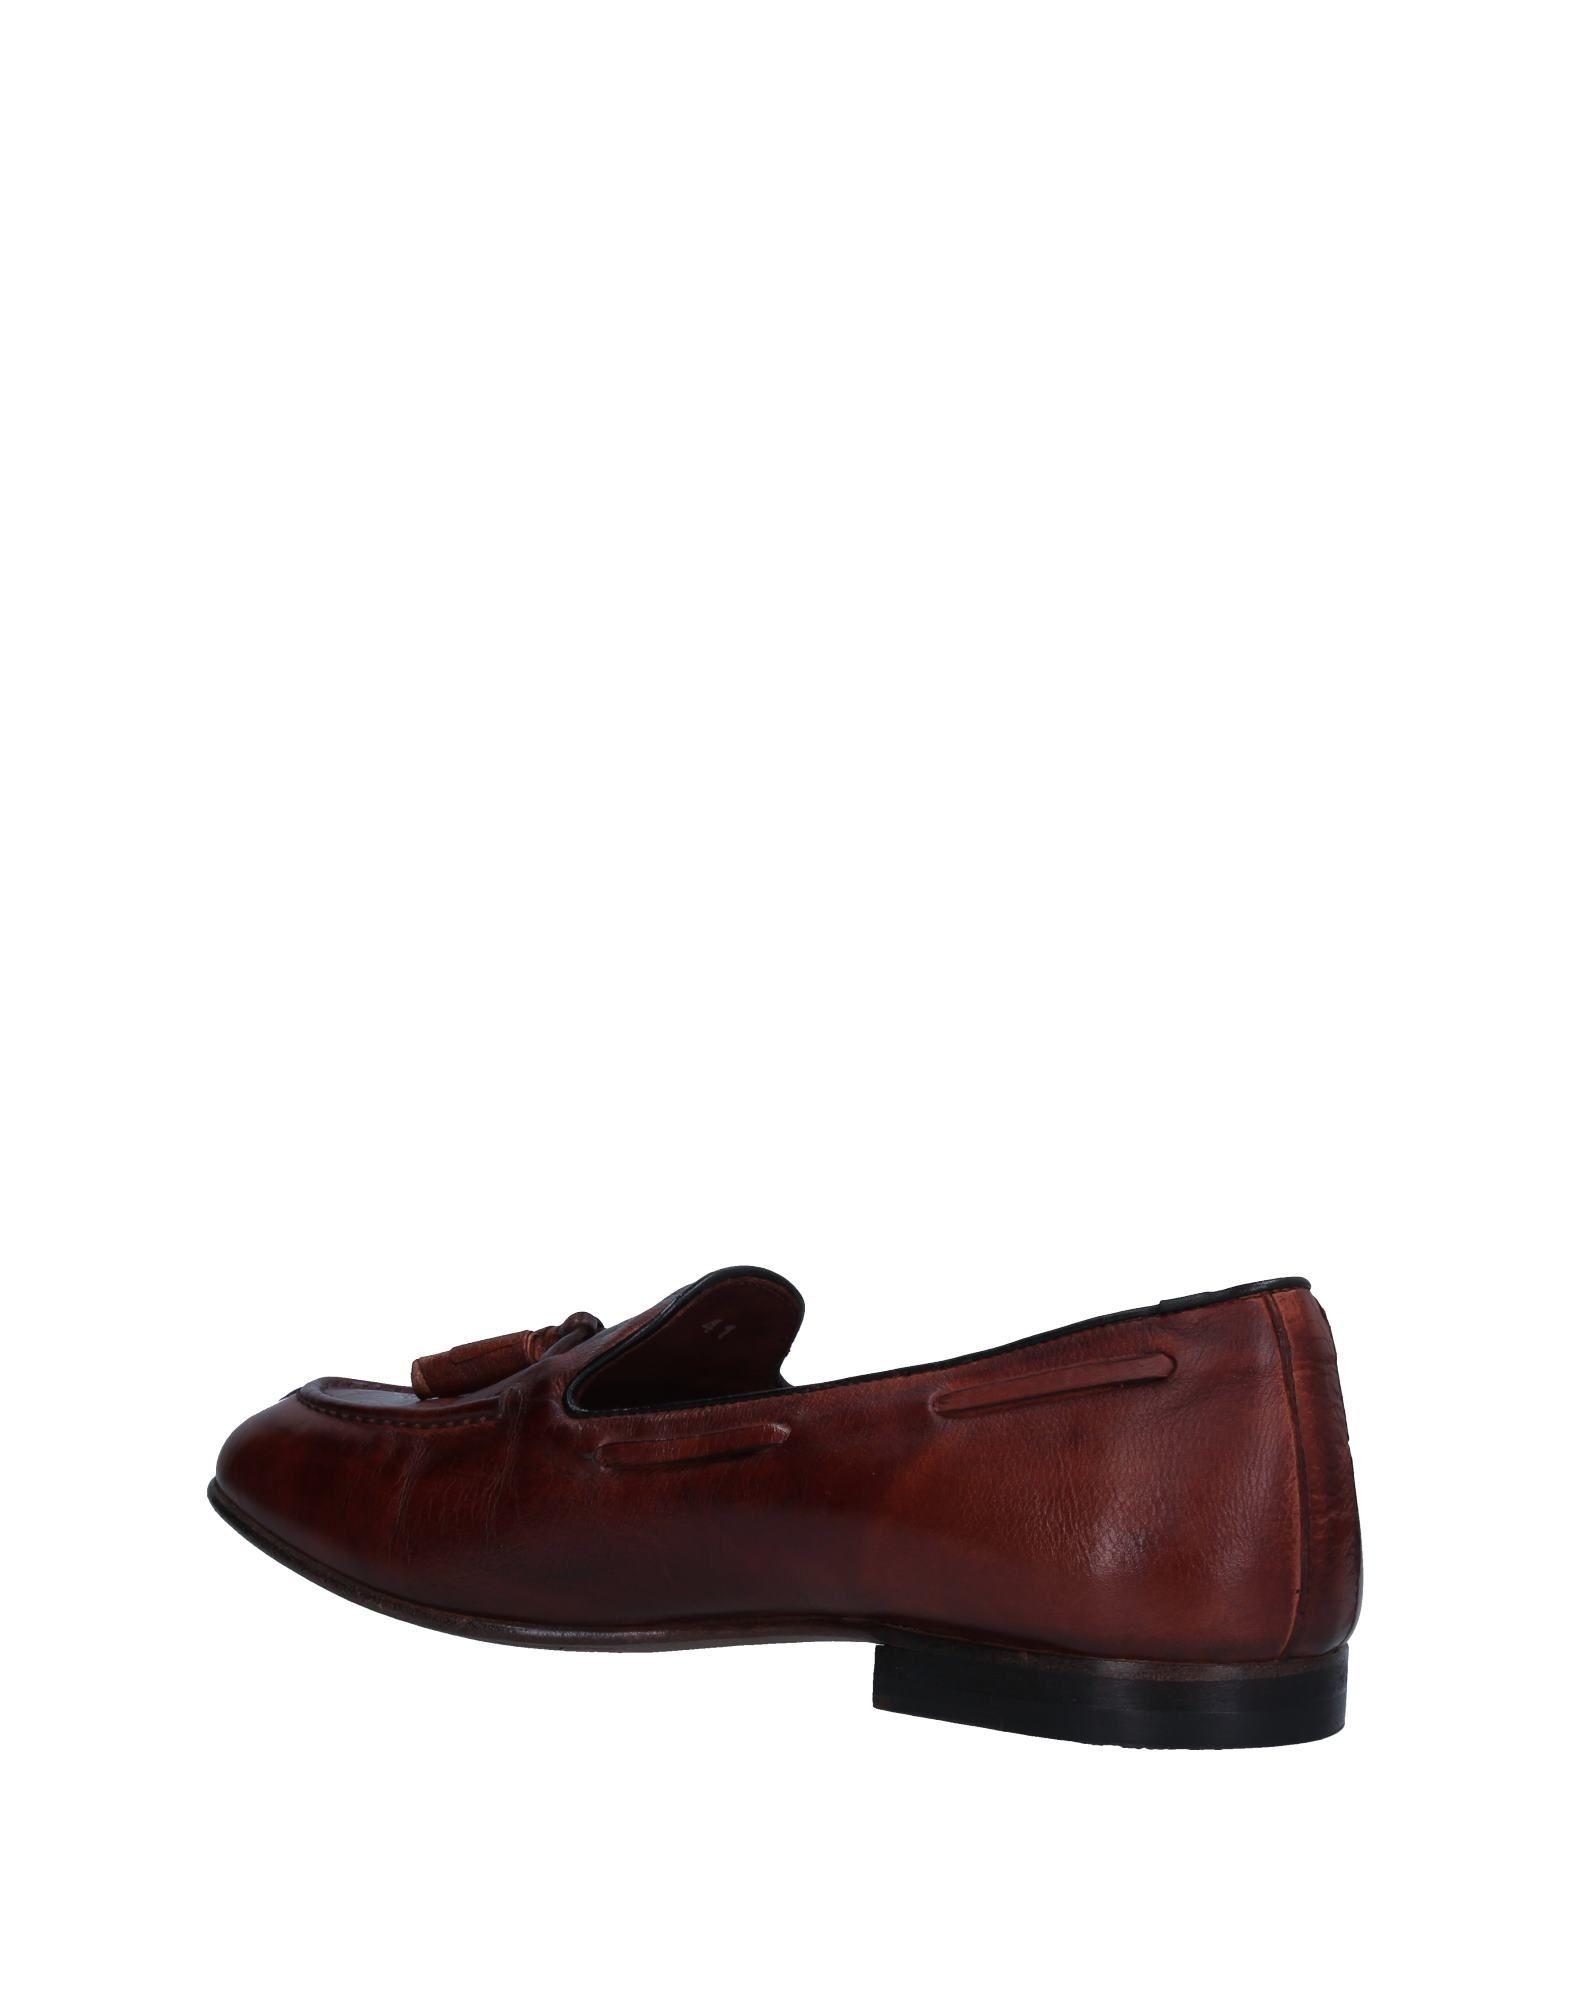 Rabatt echte Schuhe Alexander Hotto Mokassins Herren  11332870LR